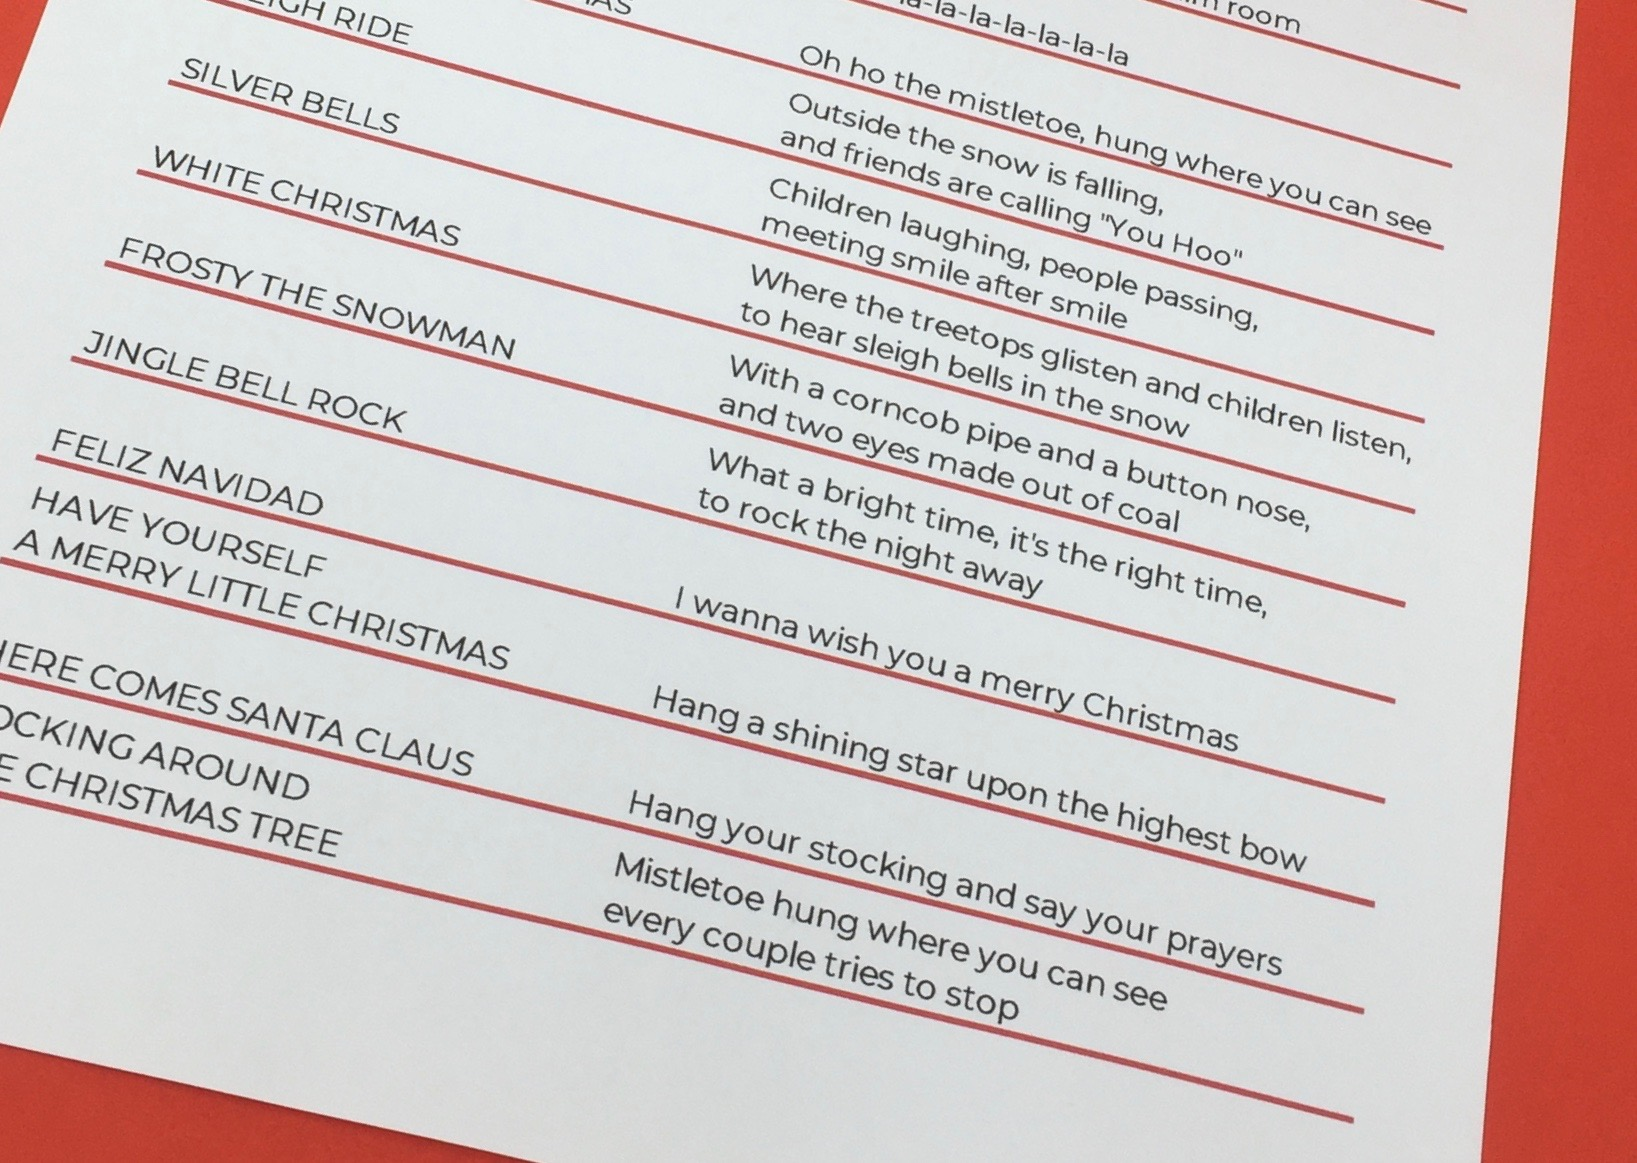 Christmas Carol Matching Game Song List for Seniors